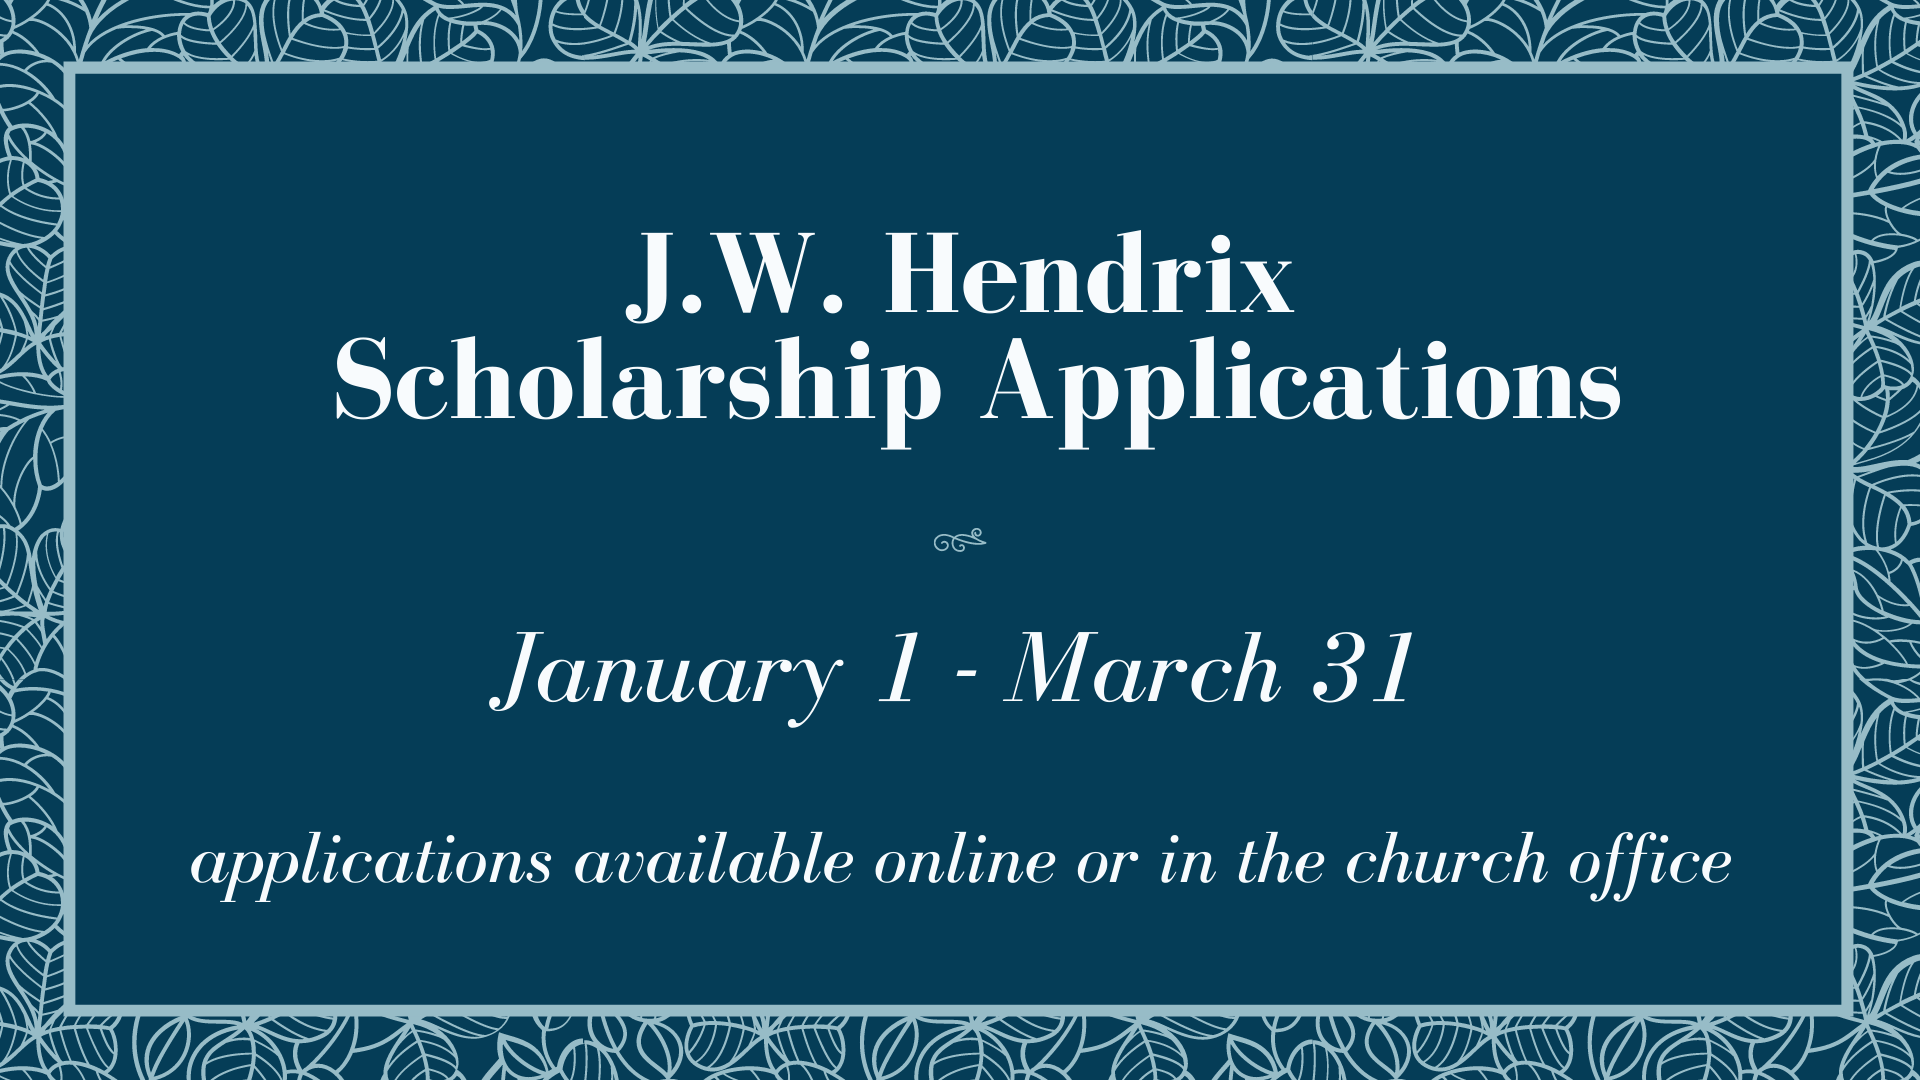 JW Hendrix Scholarship